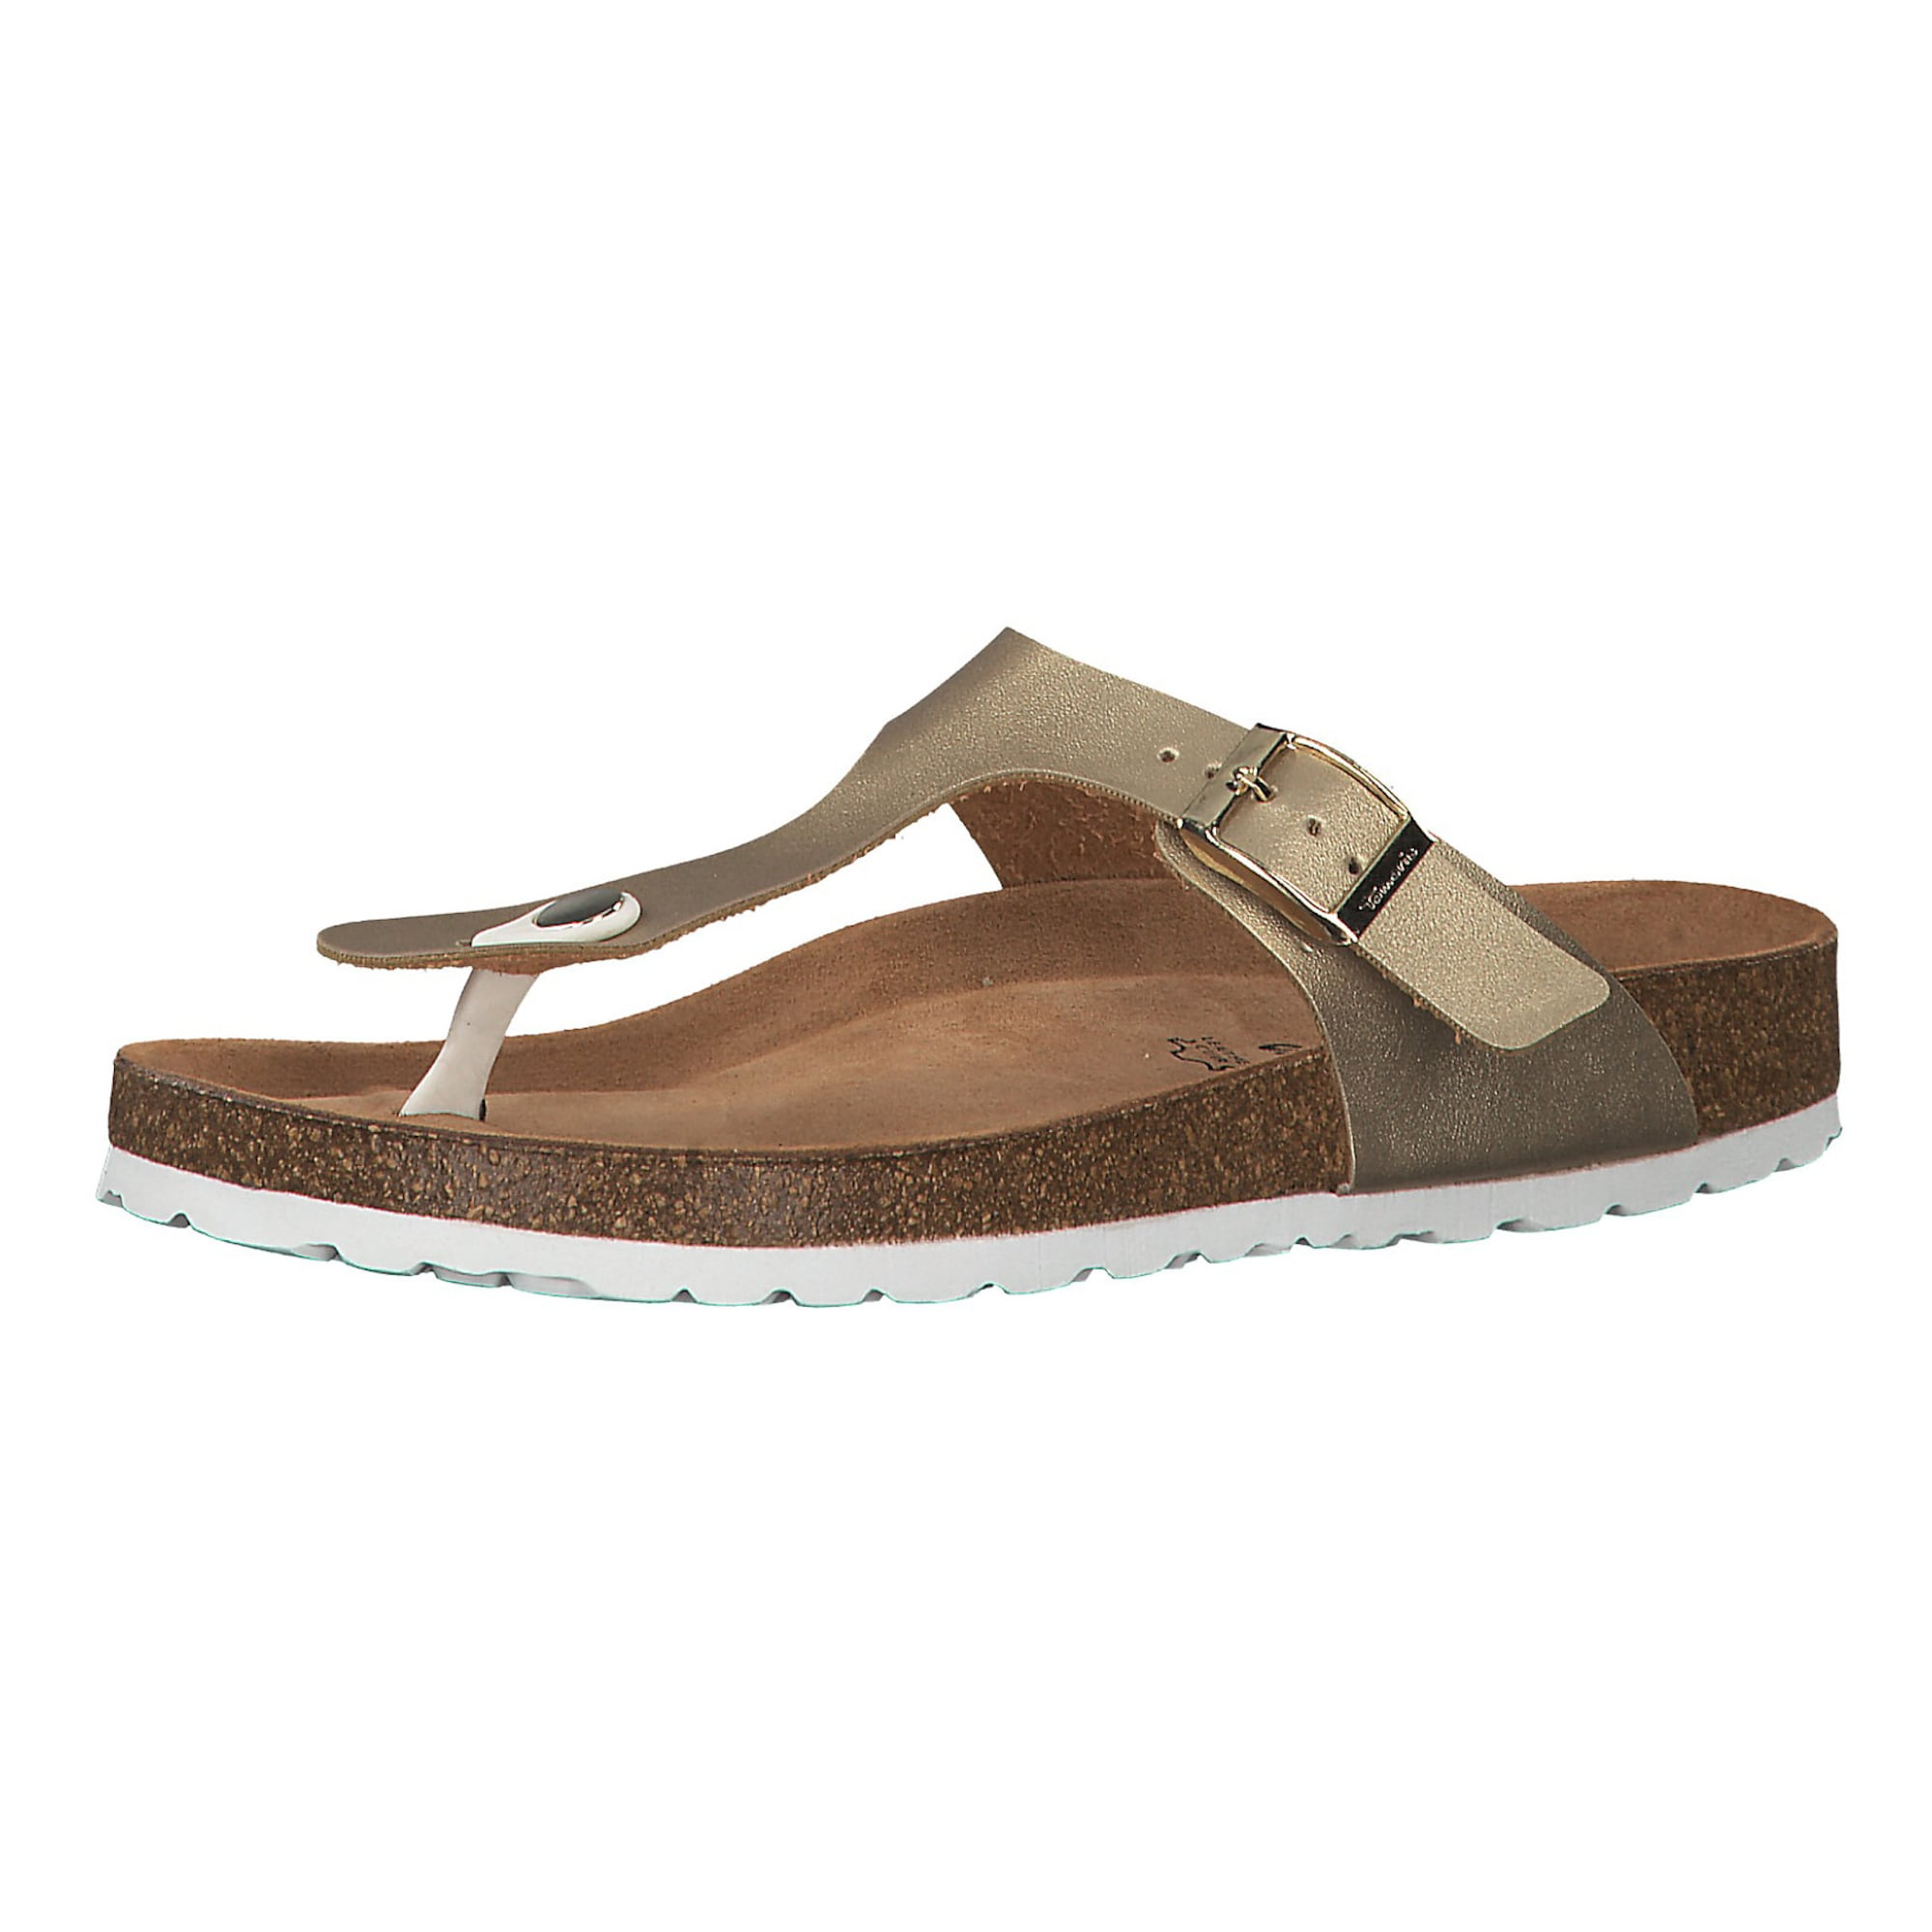 Zehentrenner | Schuhe > Sandalen & Zehentrenner | tamaris